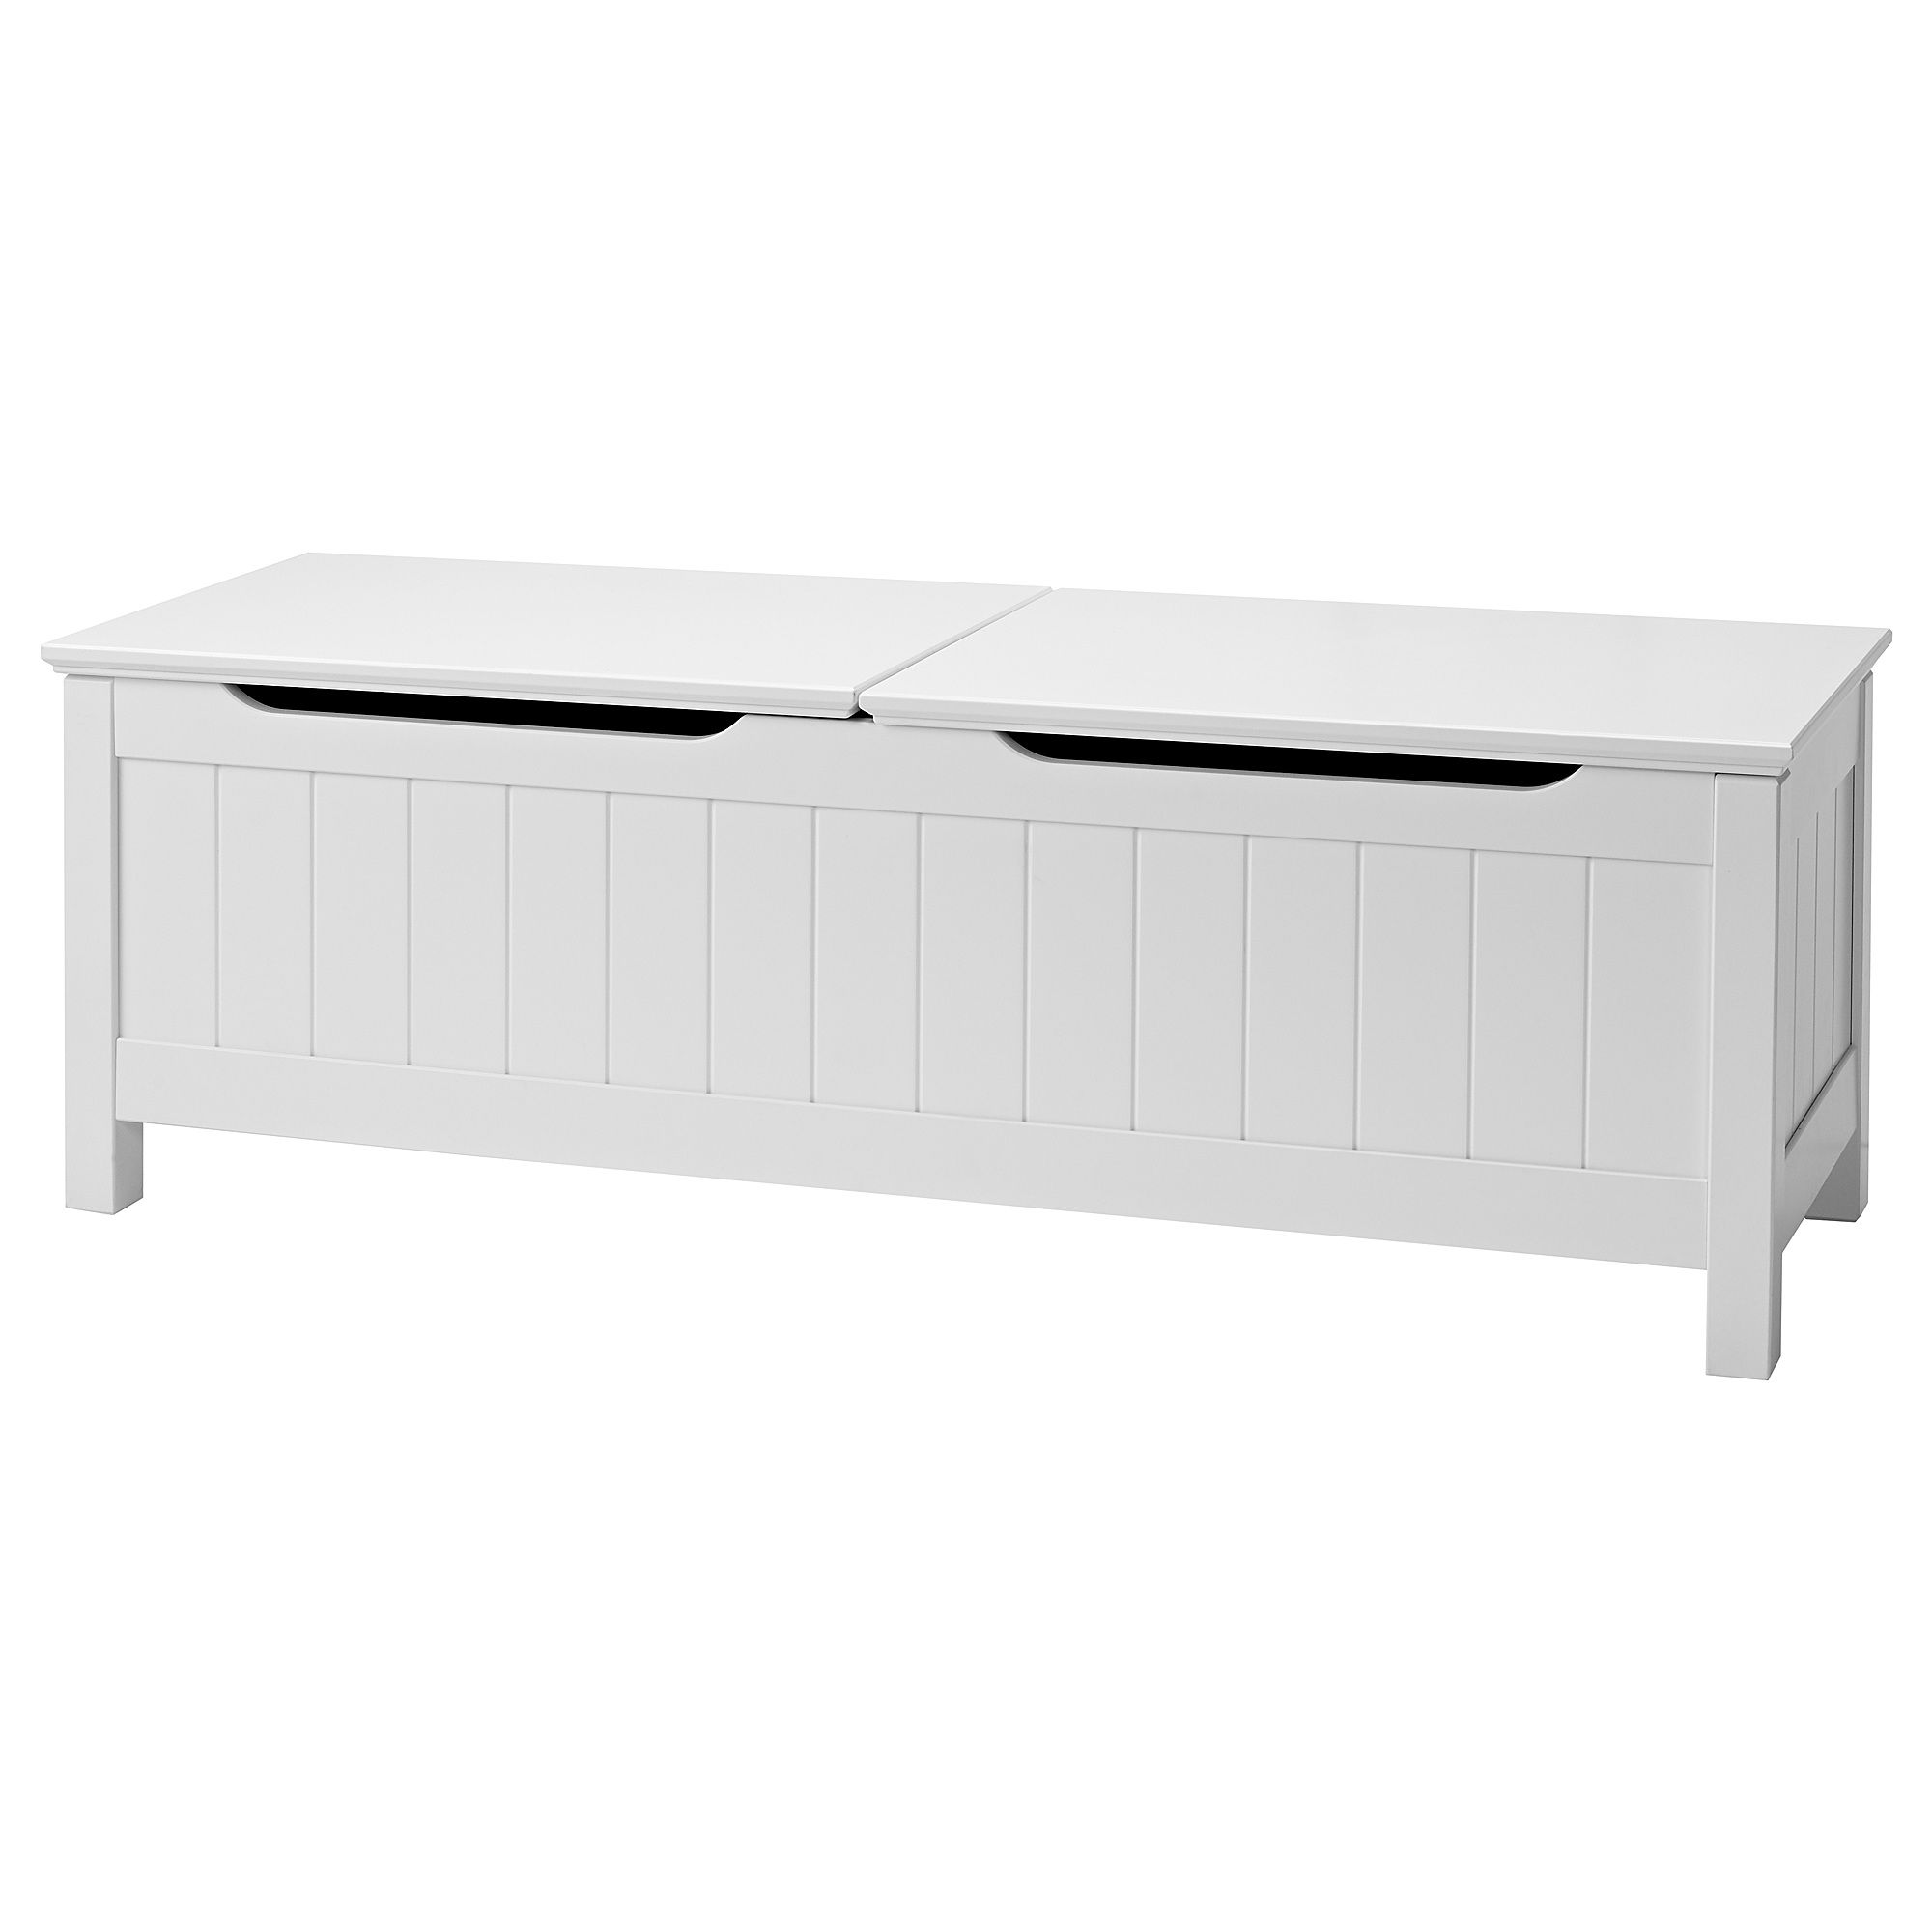 Furniture And Home Furnishings Storage Bench Ikea Storage